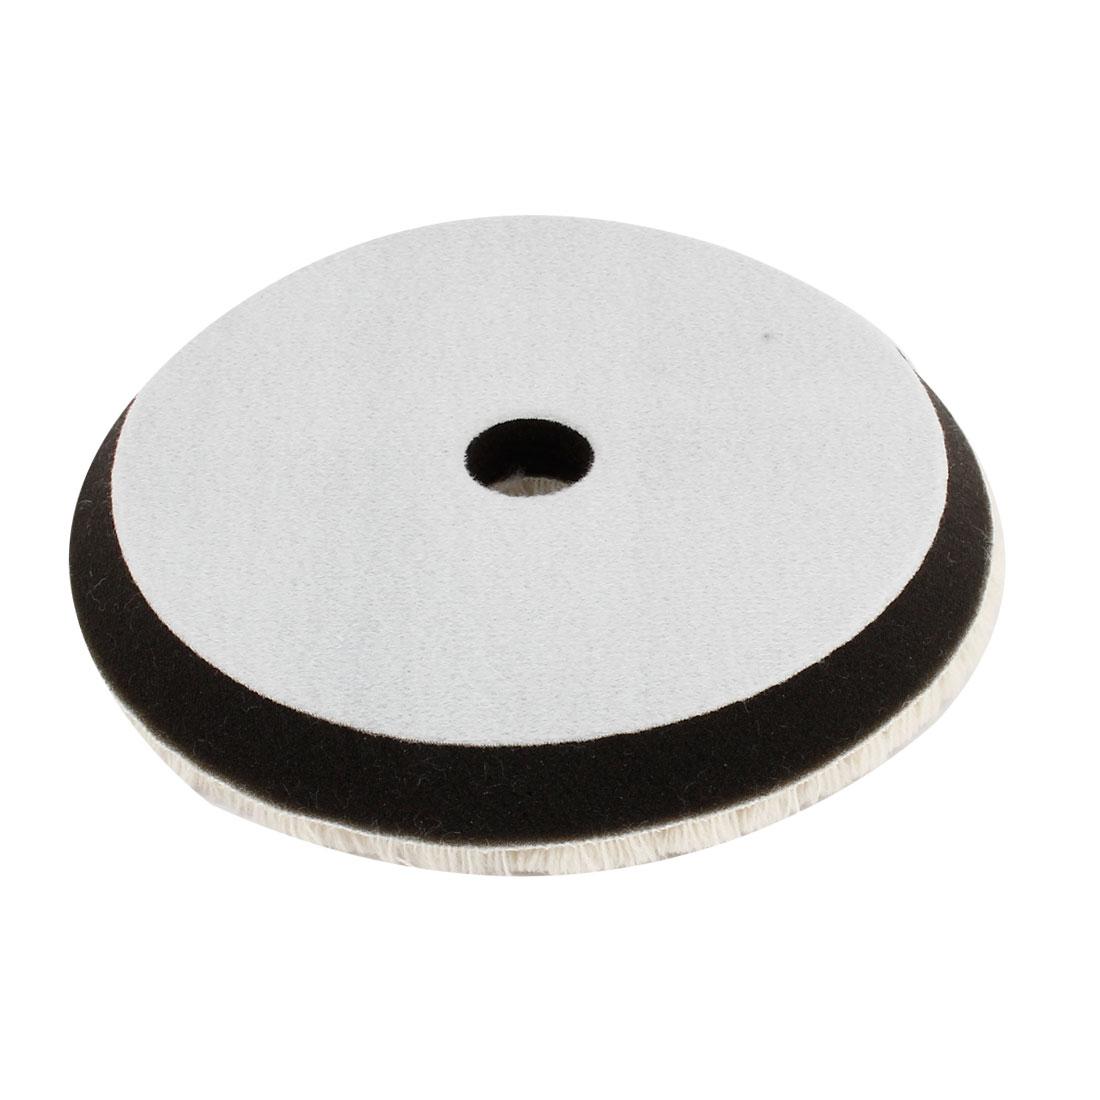 20mm Dia Hole 18cm Dia Round Faux Wool Sponge Car Polishing Wheel Black Beige